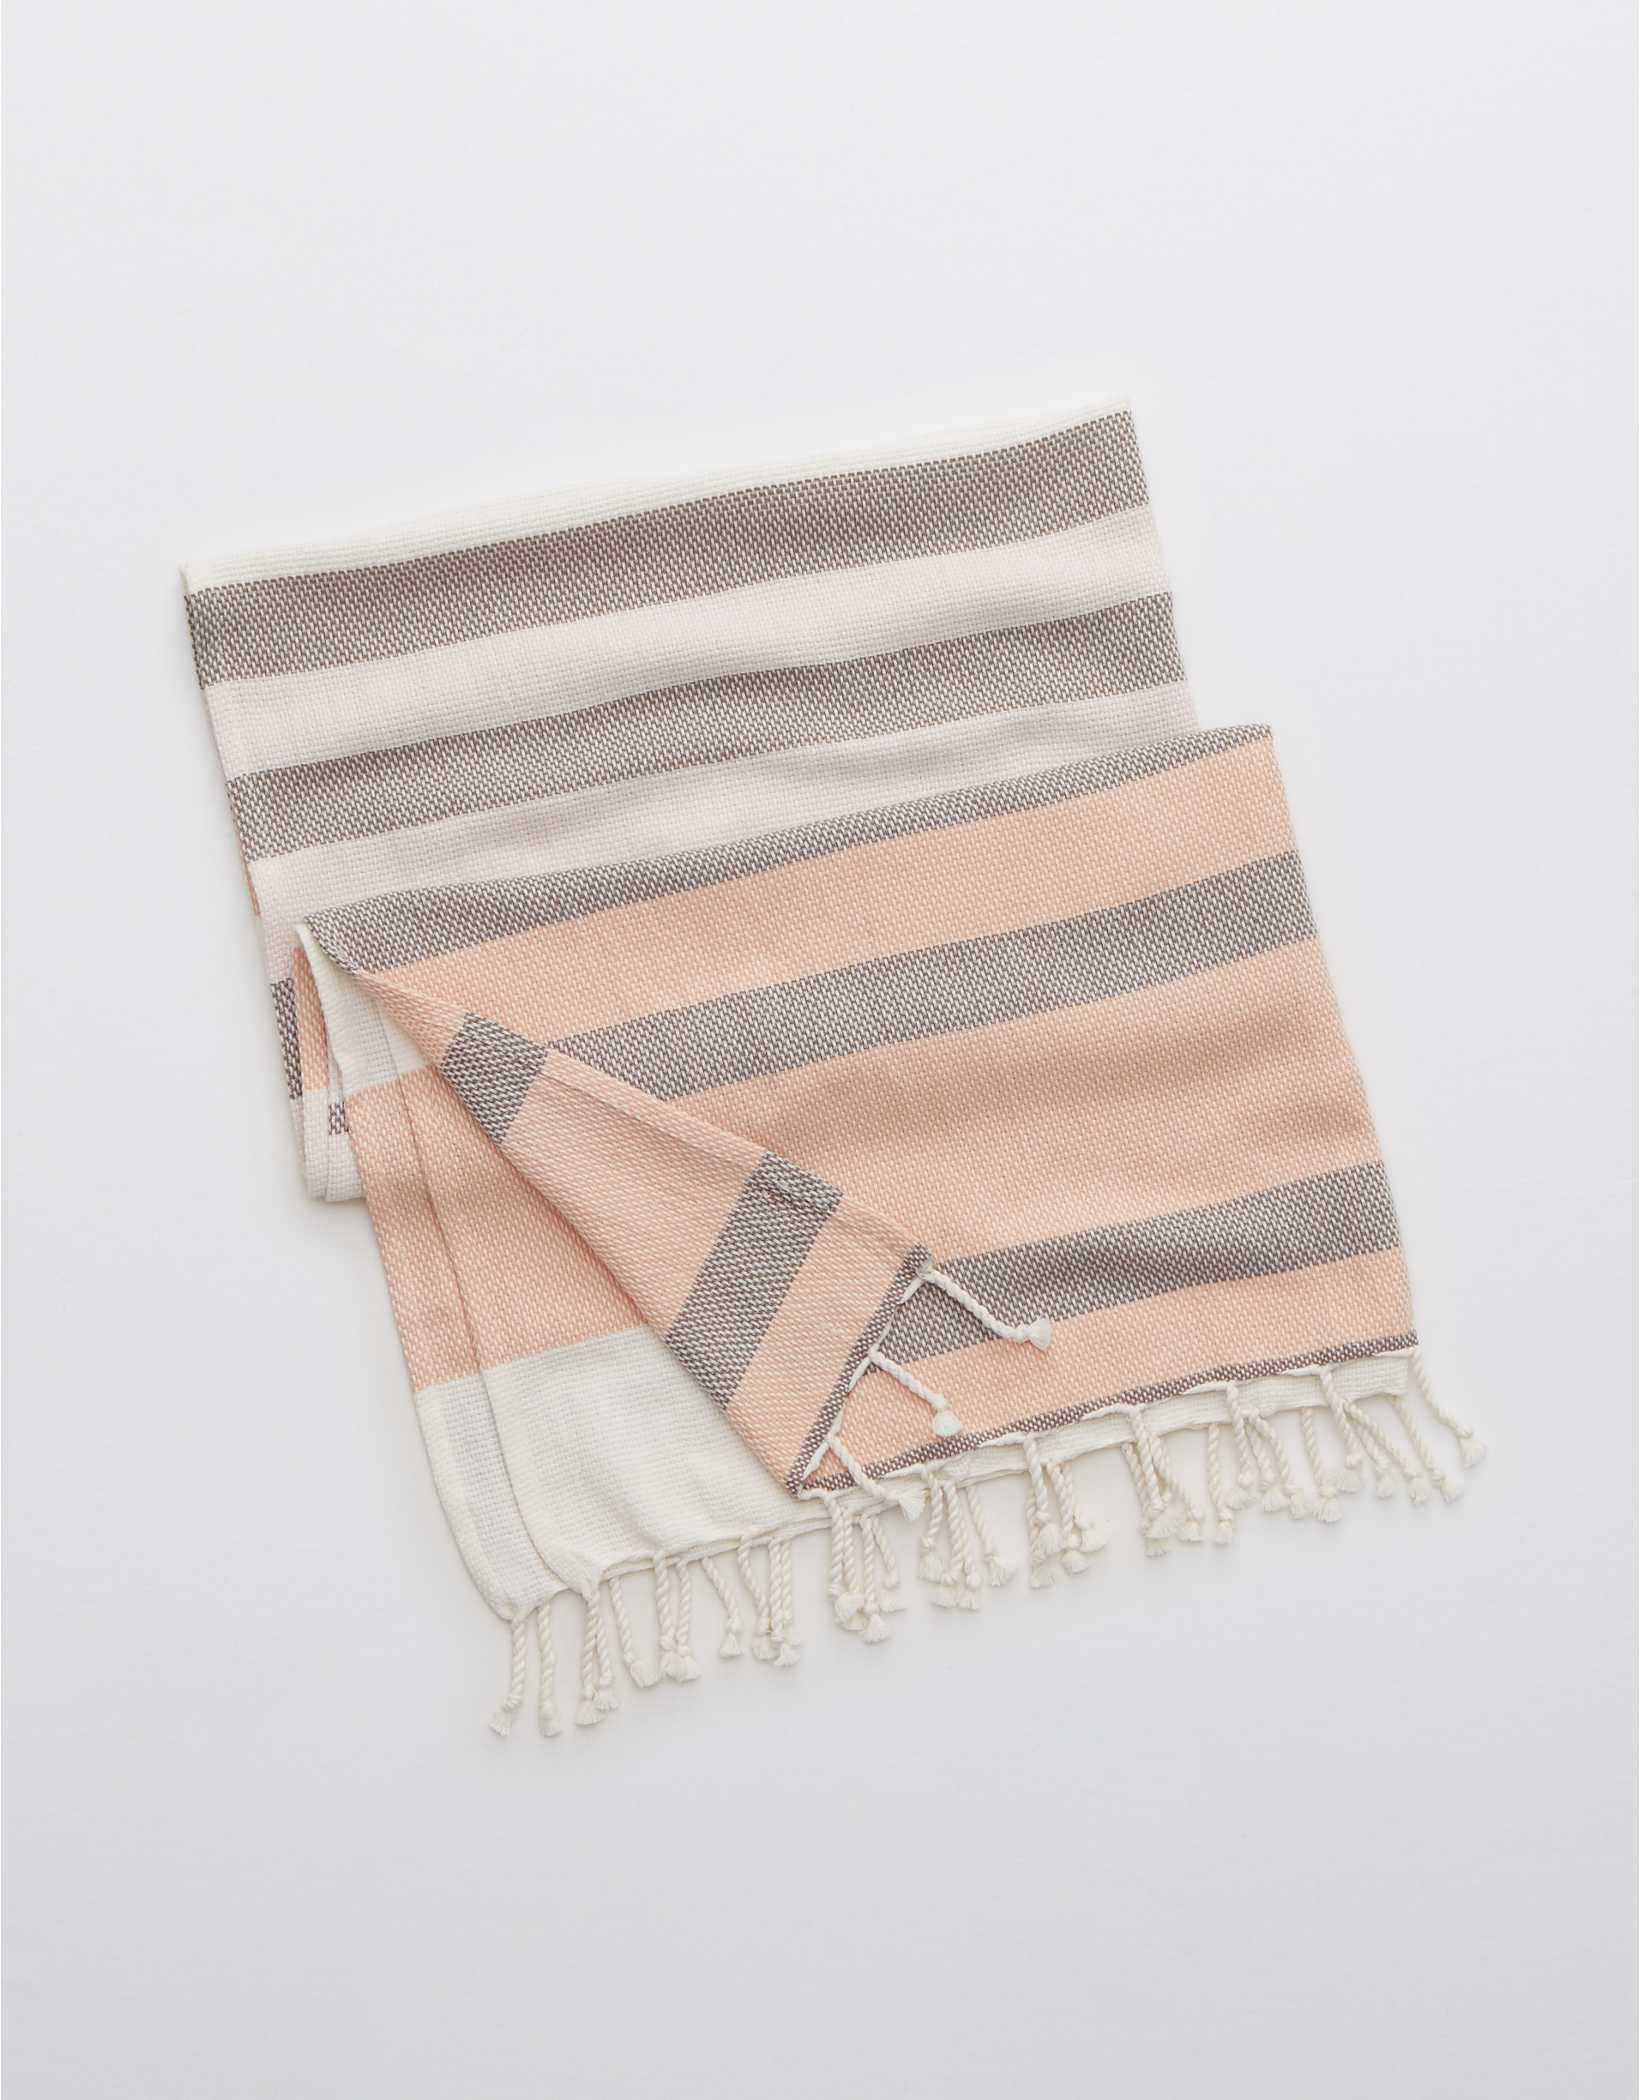 Aerie Beach Blanket